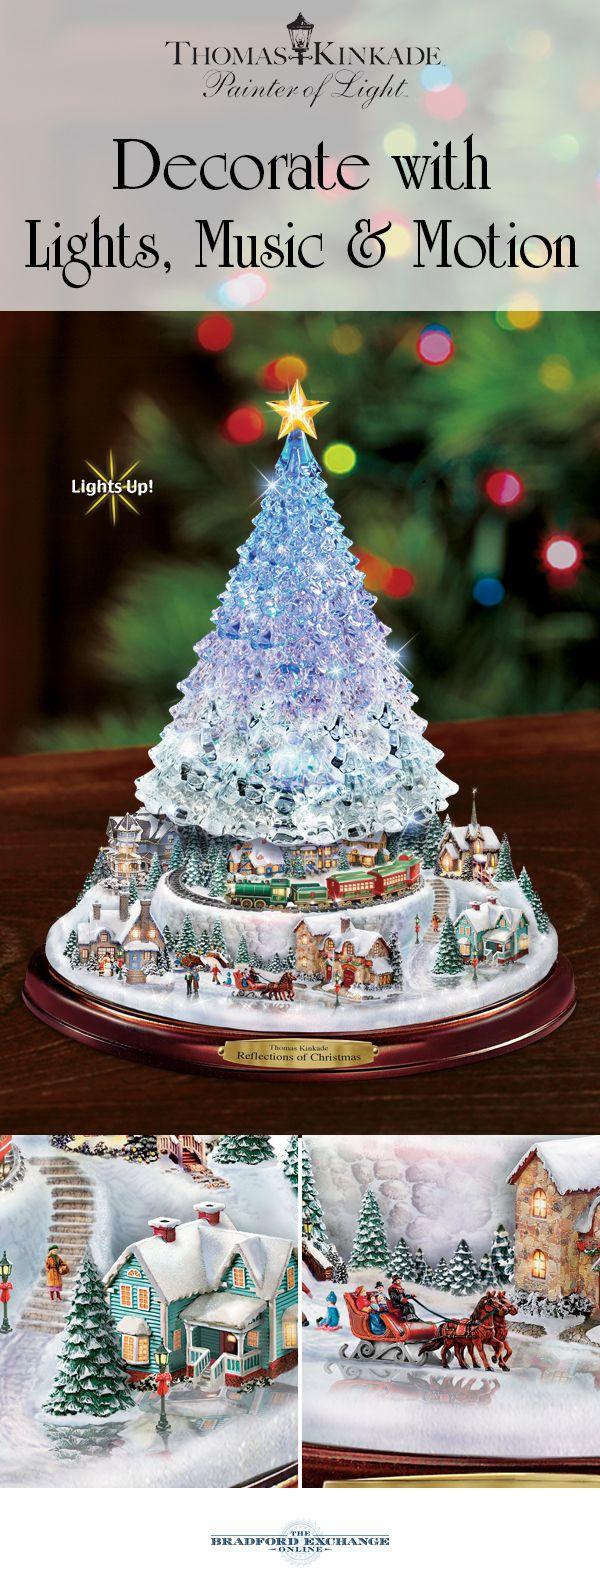 Bradford christmas ornaments - Thomas Kinkade Reflections Of Christmas Tabletop Tree